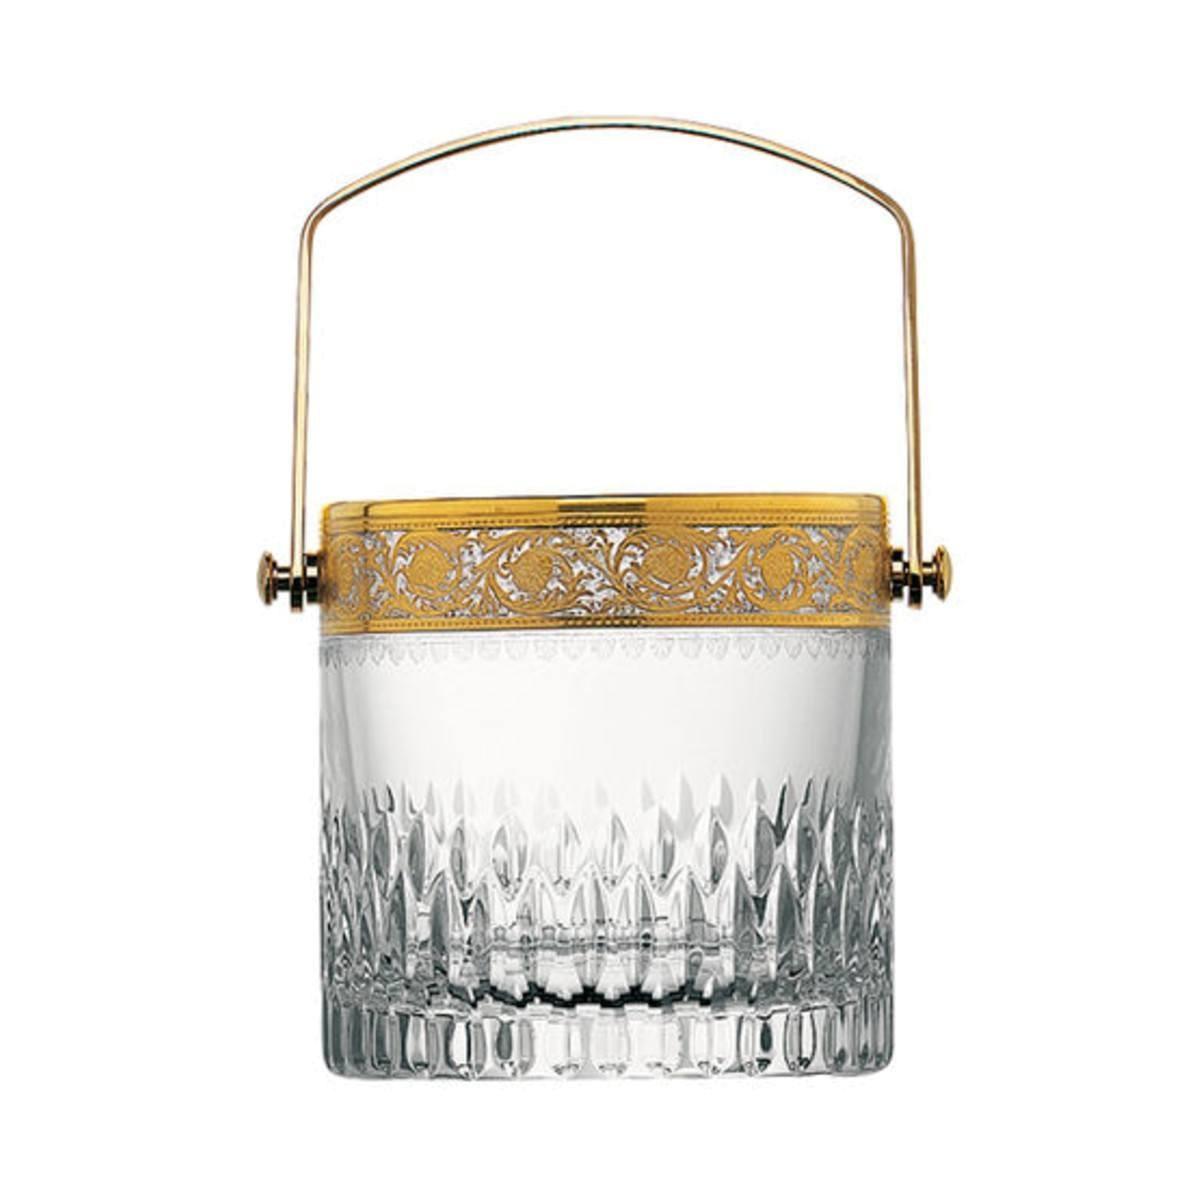 THISTLE GOLD ICE BUCKETS  Chiaia Interior Design